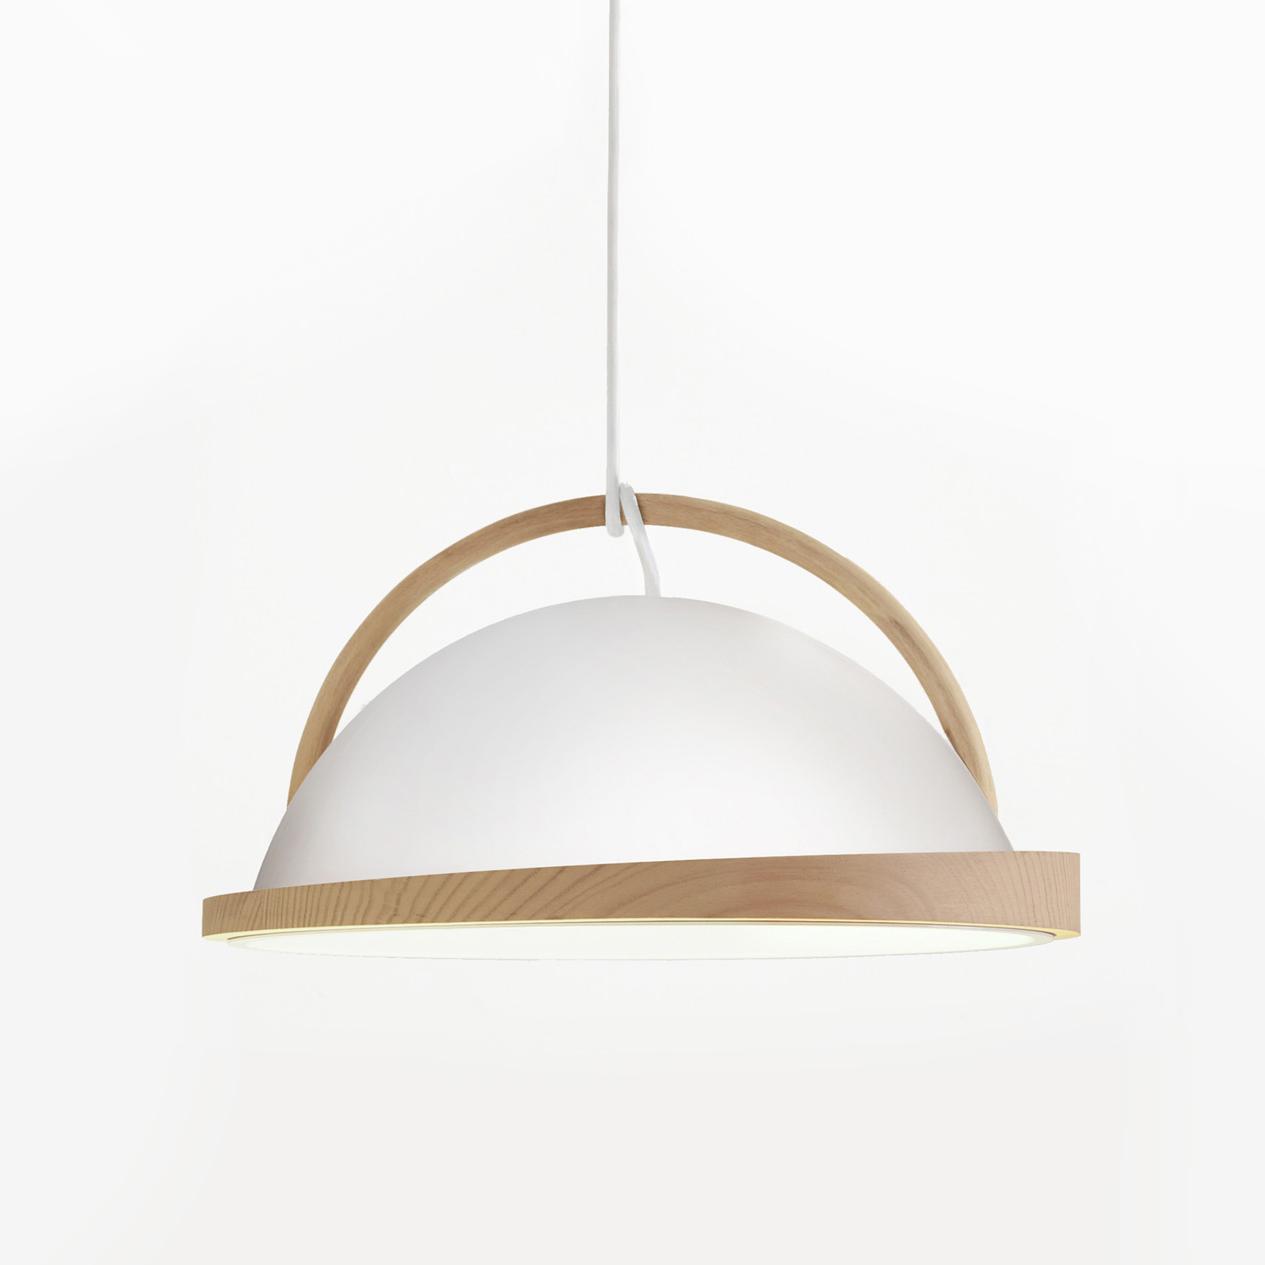 obelia pendant light with ash rim and beech arc